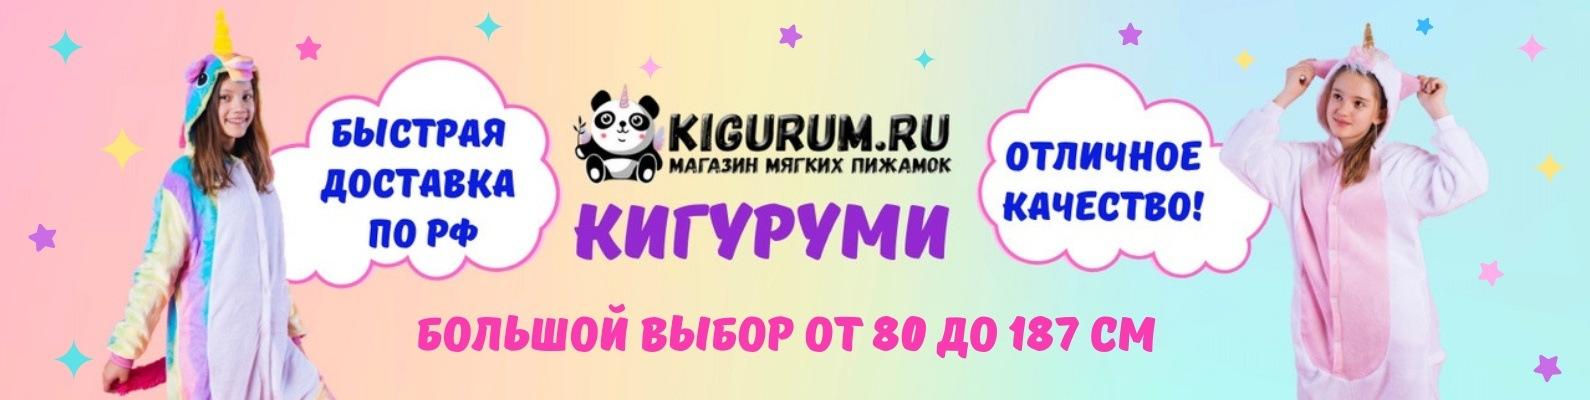 Костюмы и пижамы Кигуруми Уфа Kigurumi  cd138d1fa1bcf